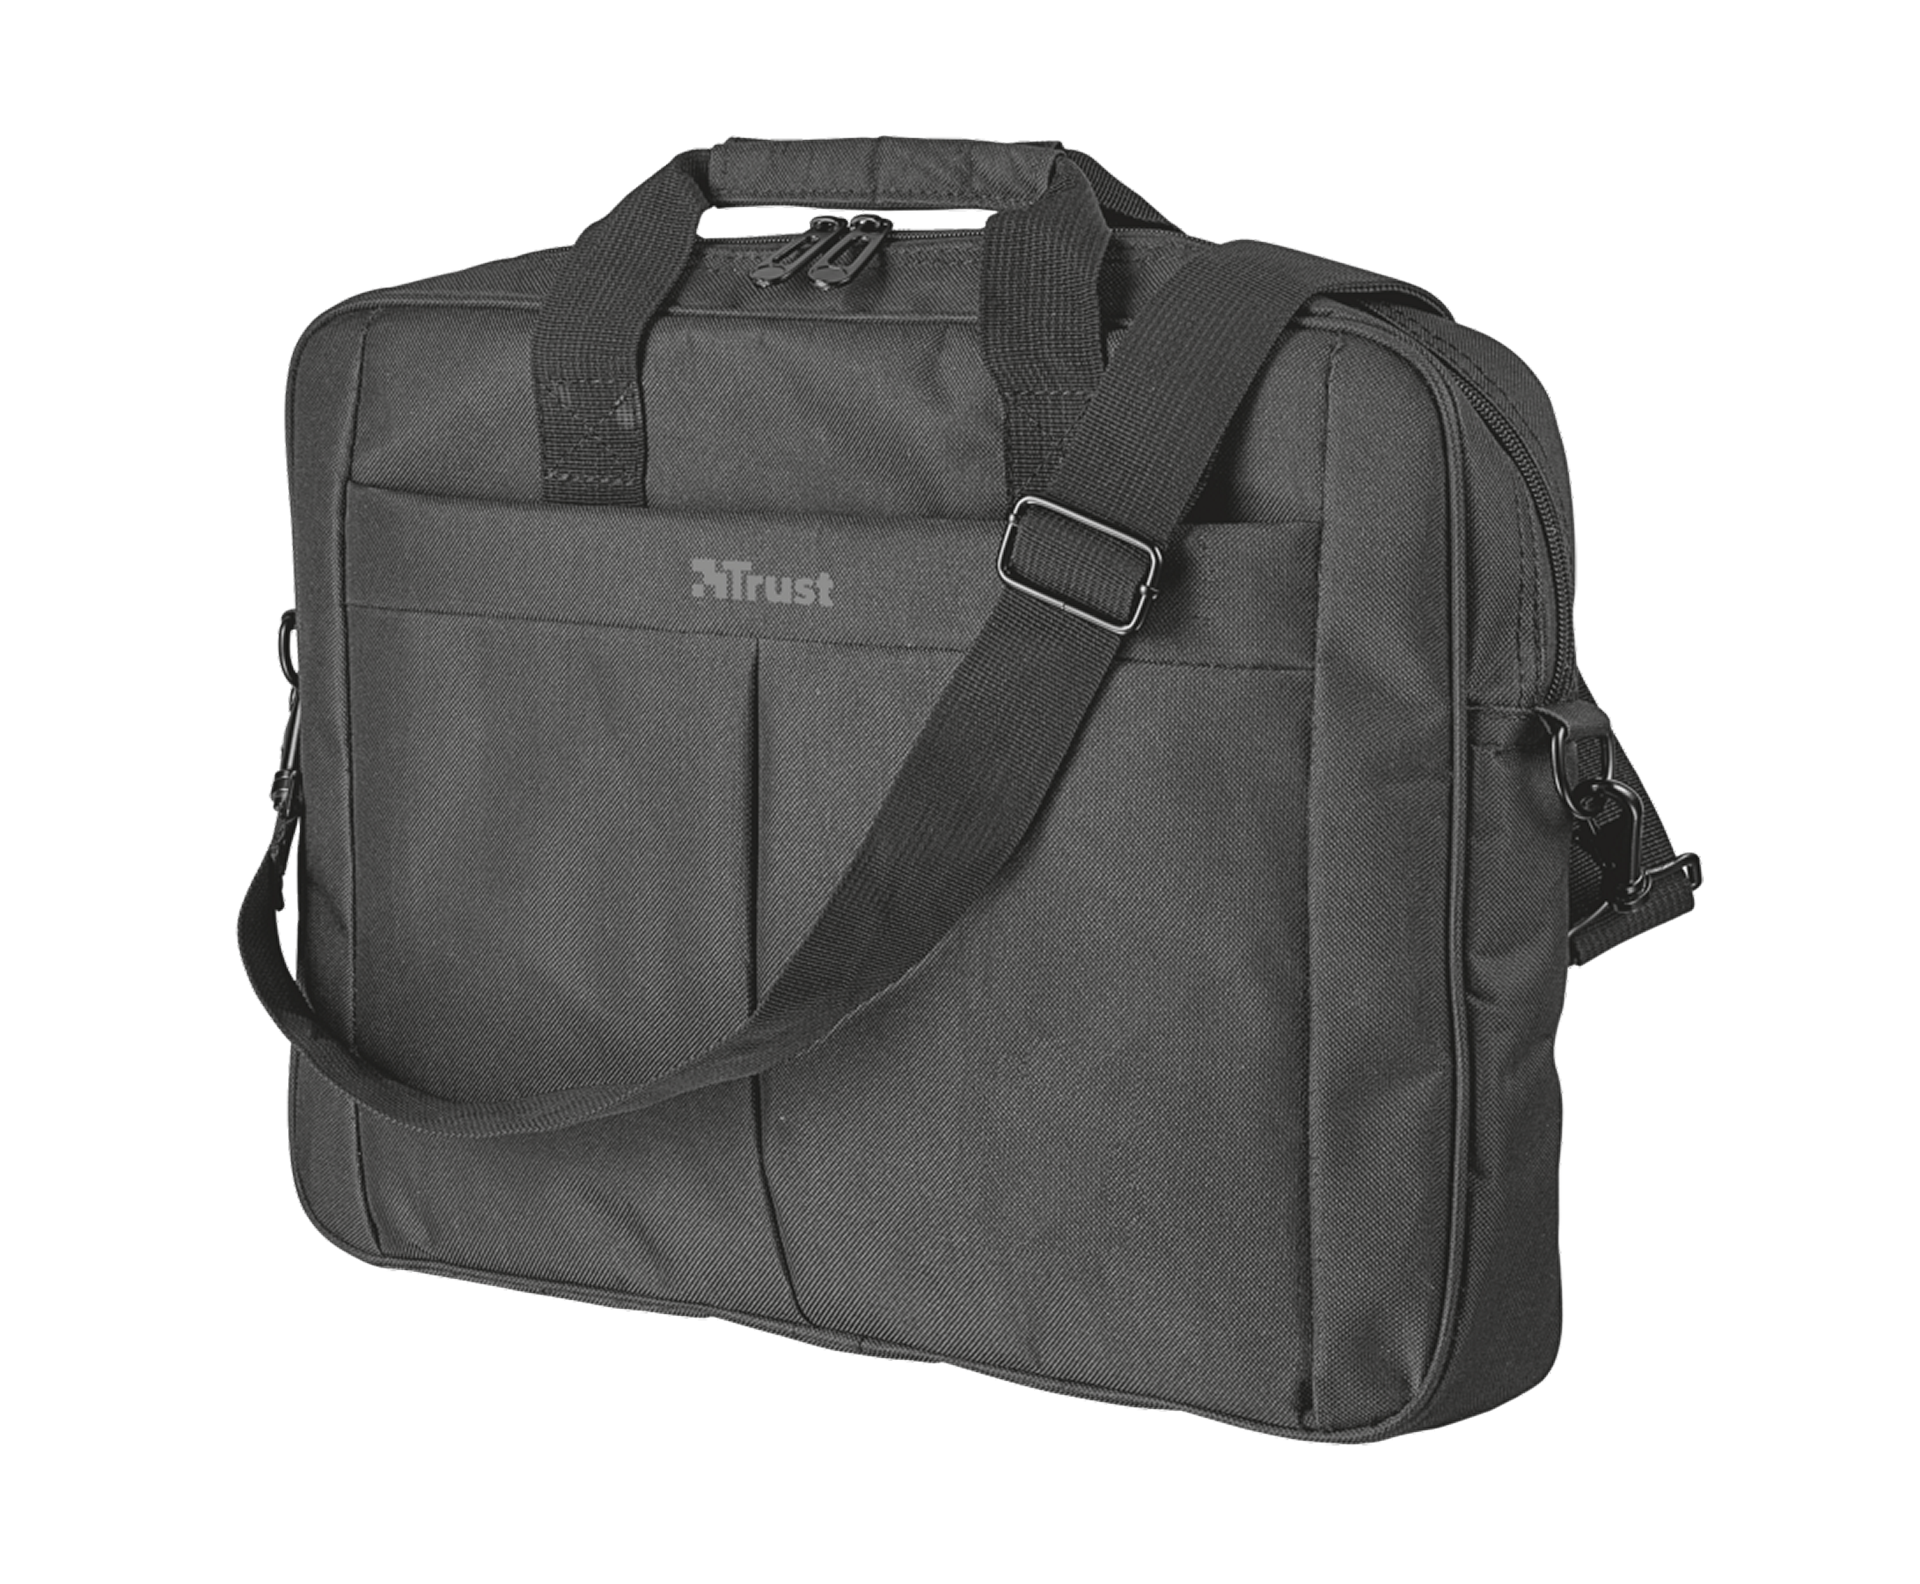 brašna TRUST Primo Carry Bag for 16' laptops